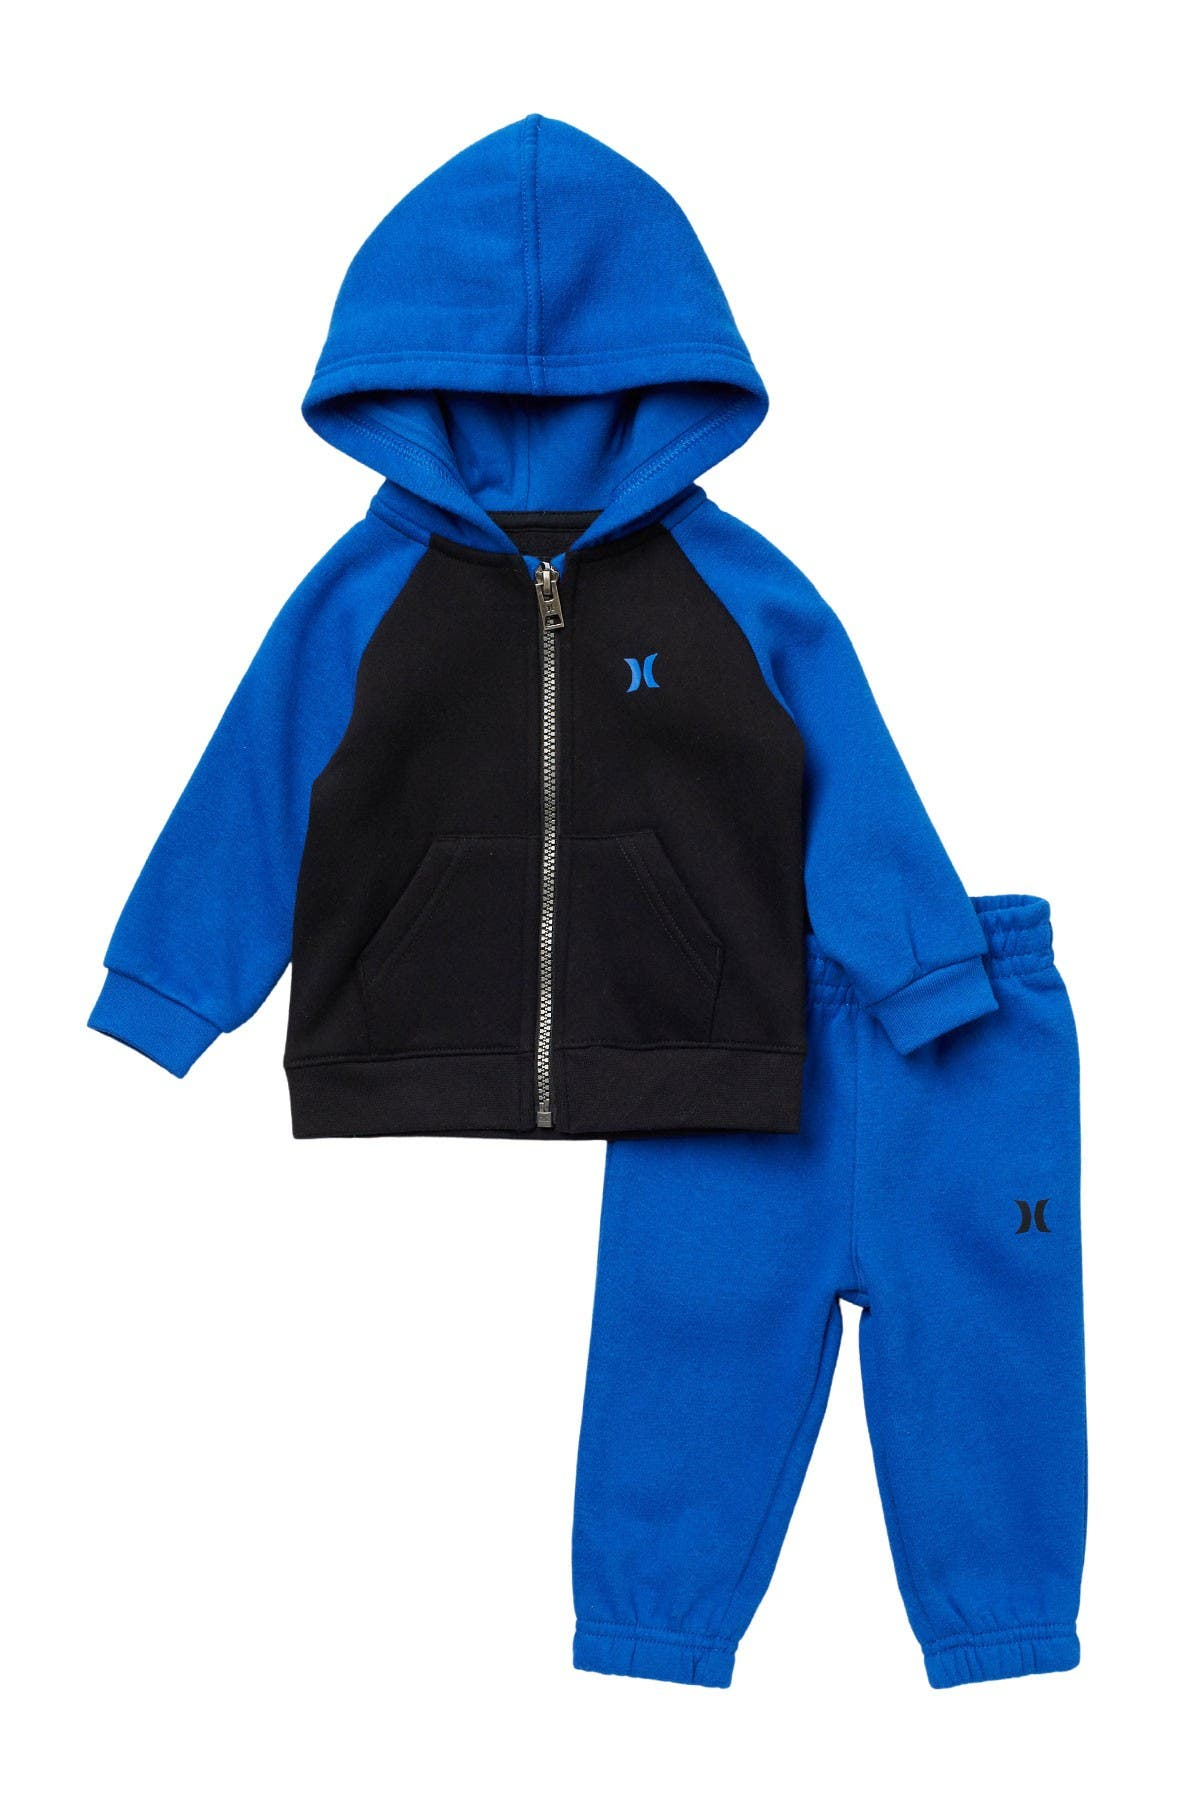 Image of Hurley Colorblock Hoodie & Sweatpant 2-Piece Set